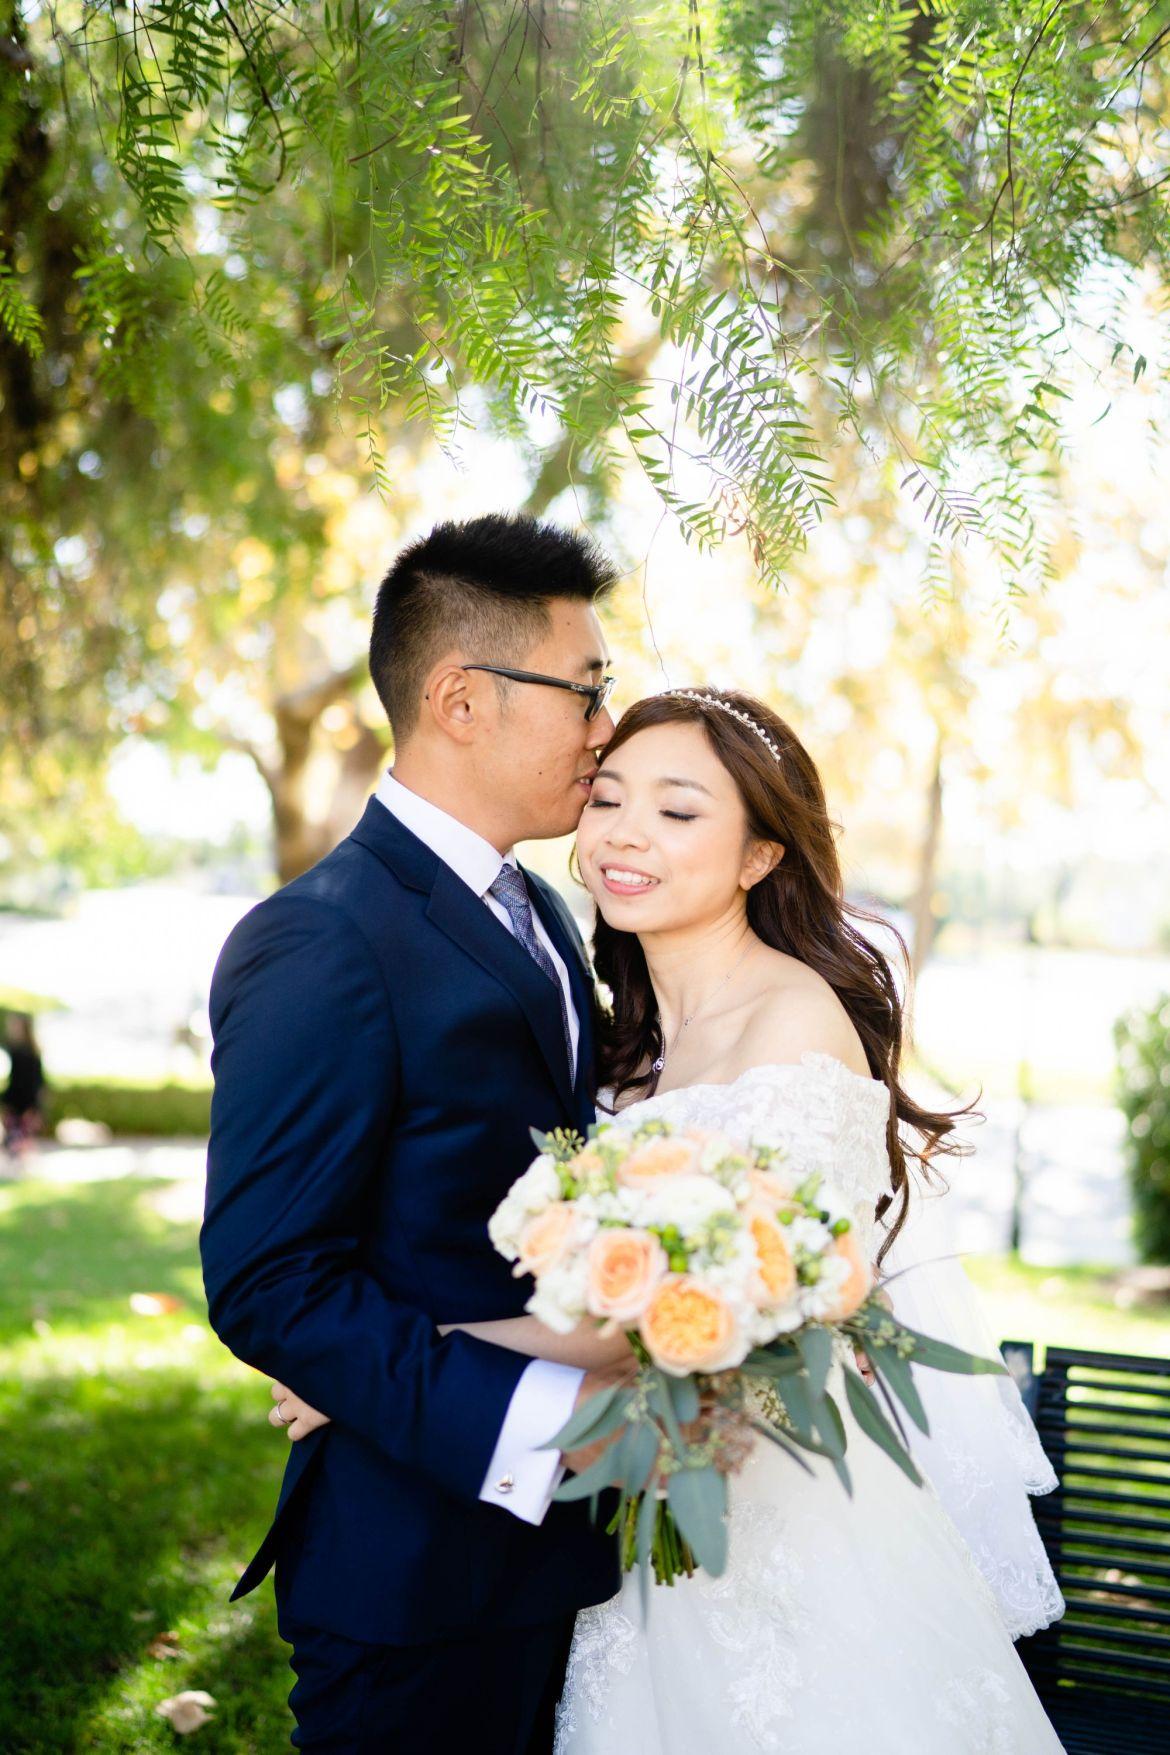 lawry's wedding